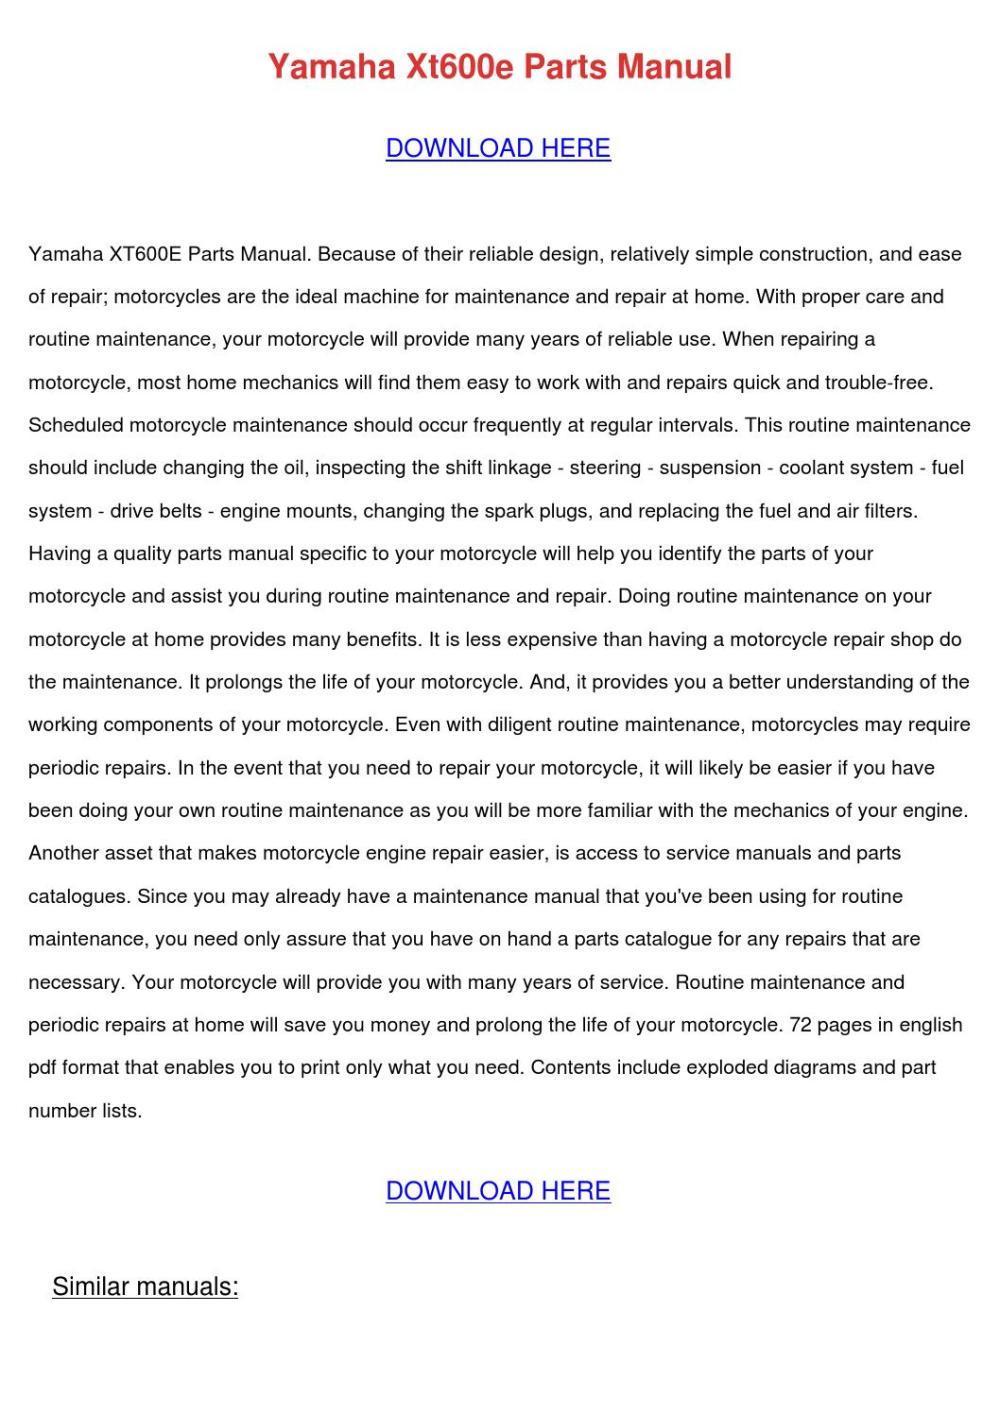 medium resolution of yamaha xt600e manuals